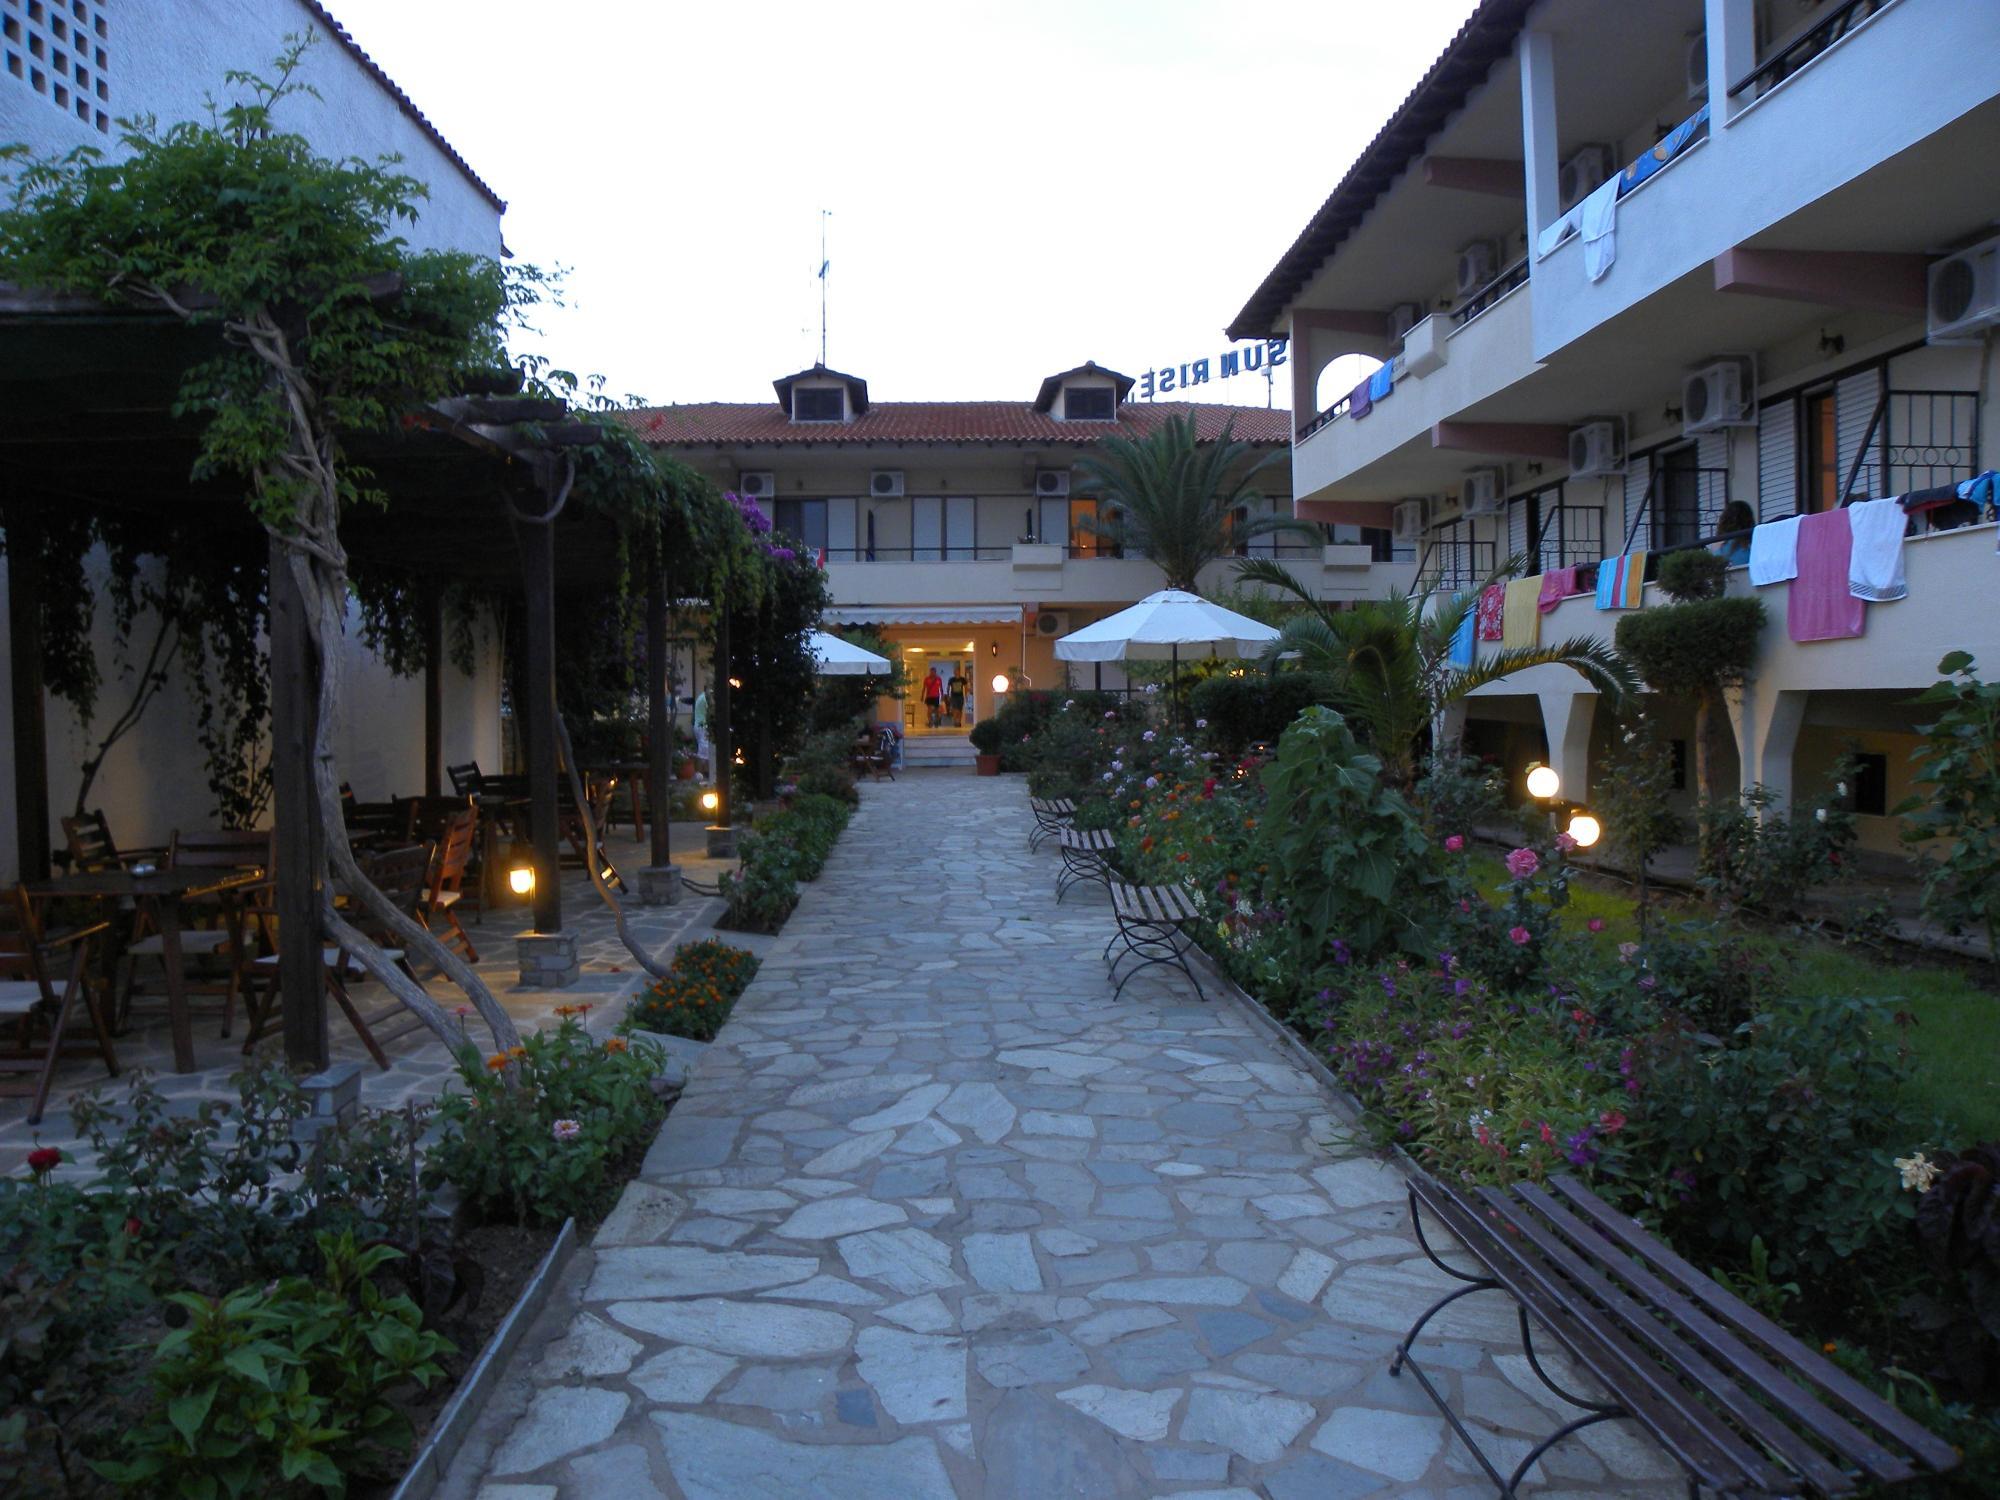 Ammouliani Greece  City pictures : Sunrise Hotel Ammouliani, Greece Halkidiki 2016 Prices & Hotel ...